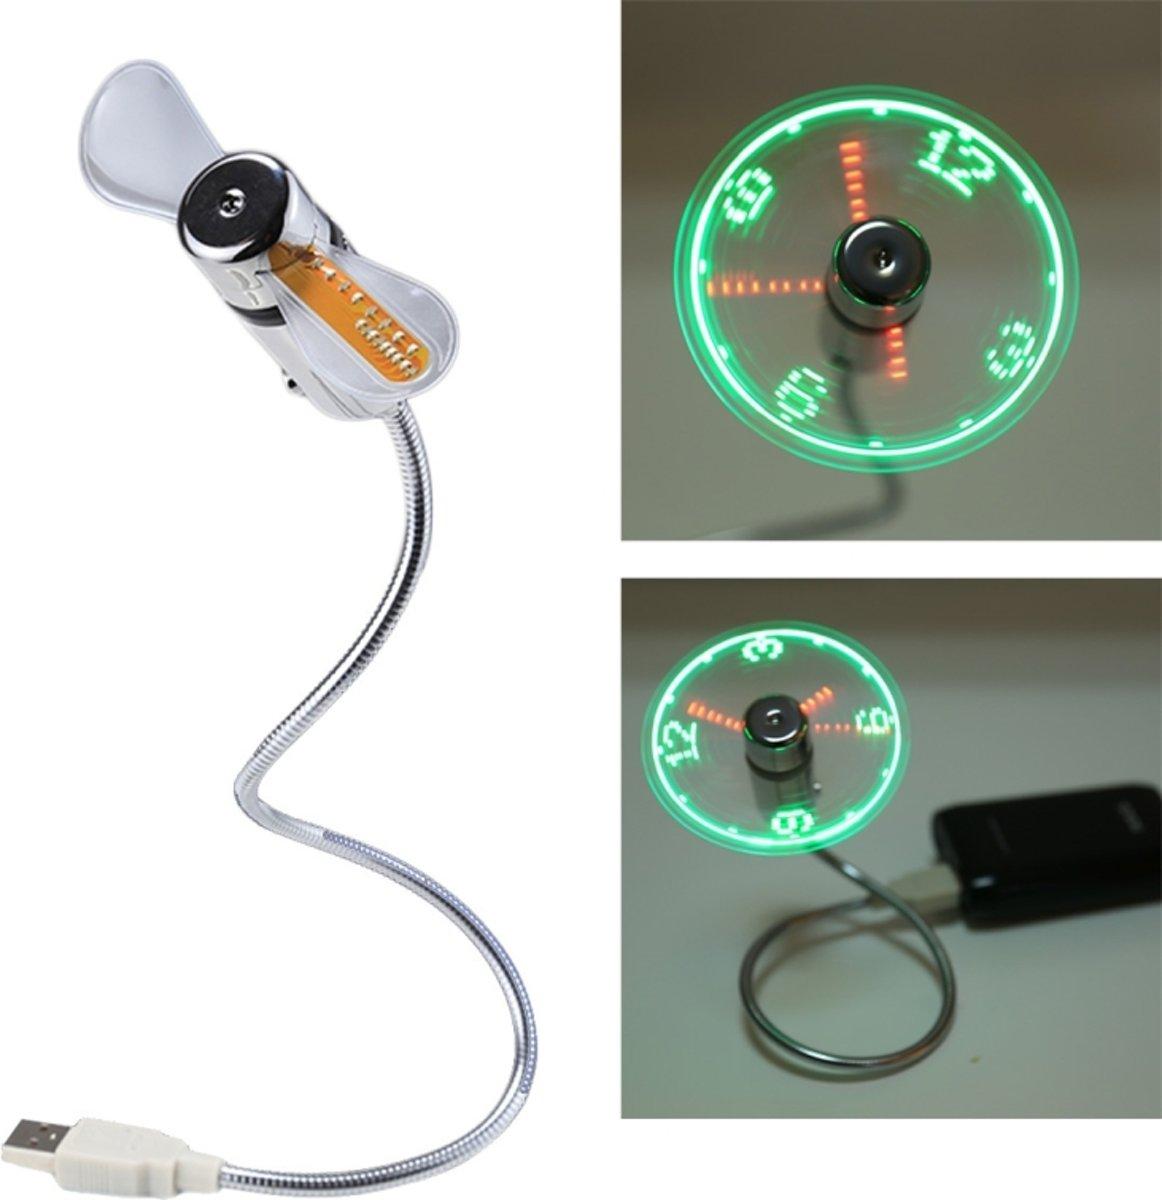 Mini USB duurzaam-klok tijd Display flexibele LED licht ventilator  DC 5V kopen